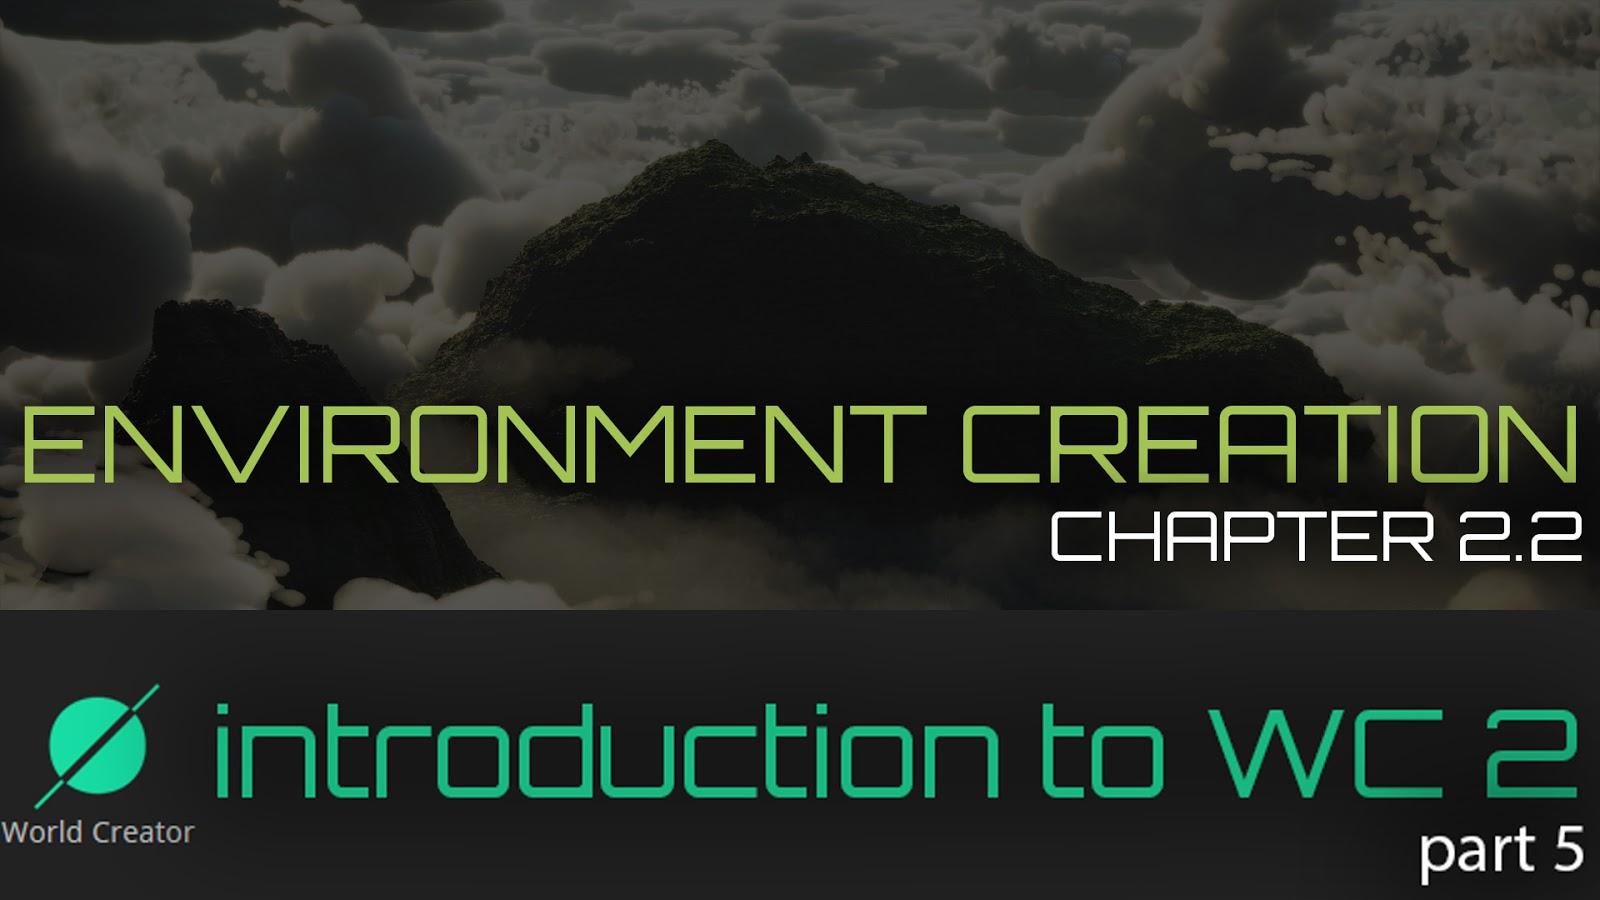 ENVIRONMENT_CREATIONp5_youtube.jpg